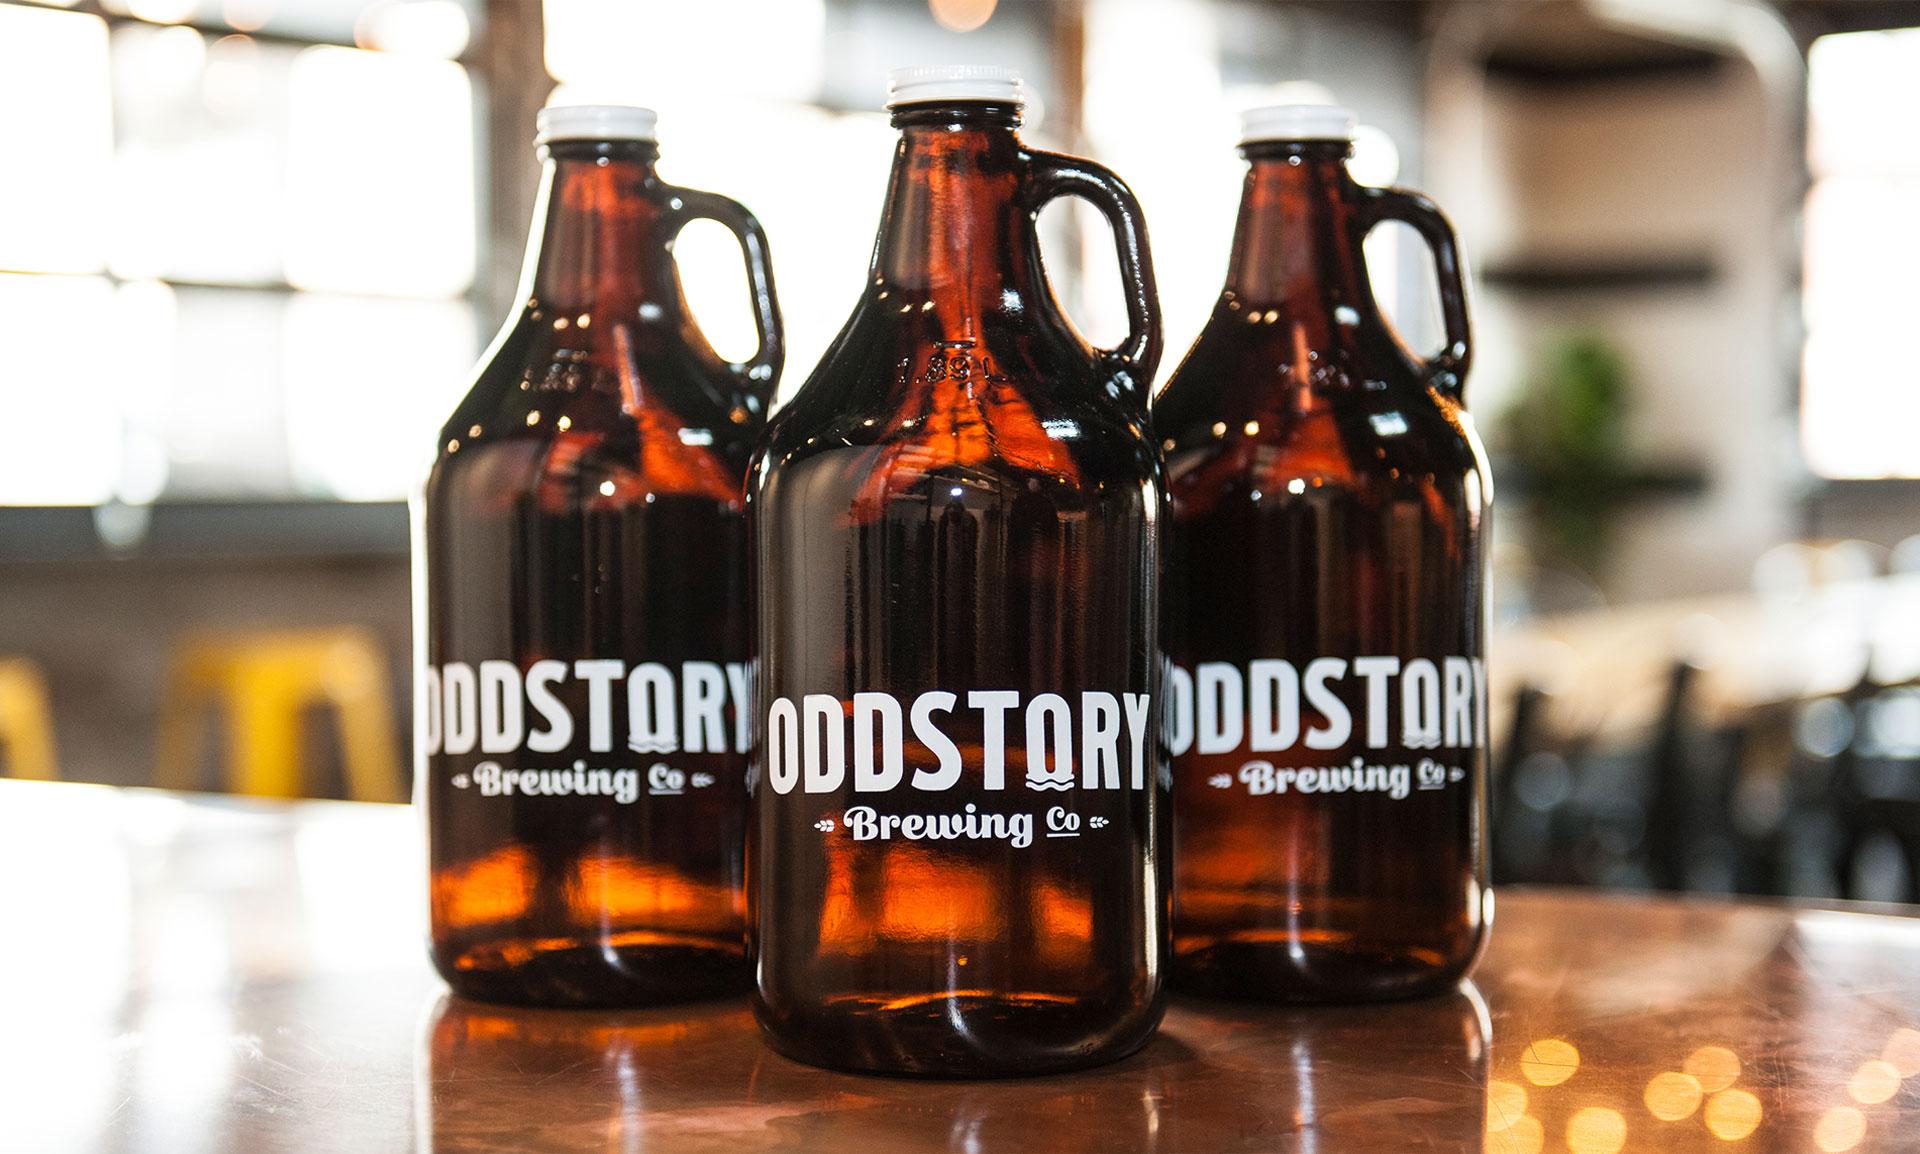 OddStory Brewing Co. - Identity, Growlers, Logos, Branding